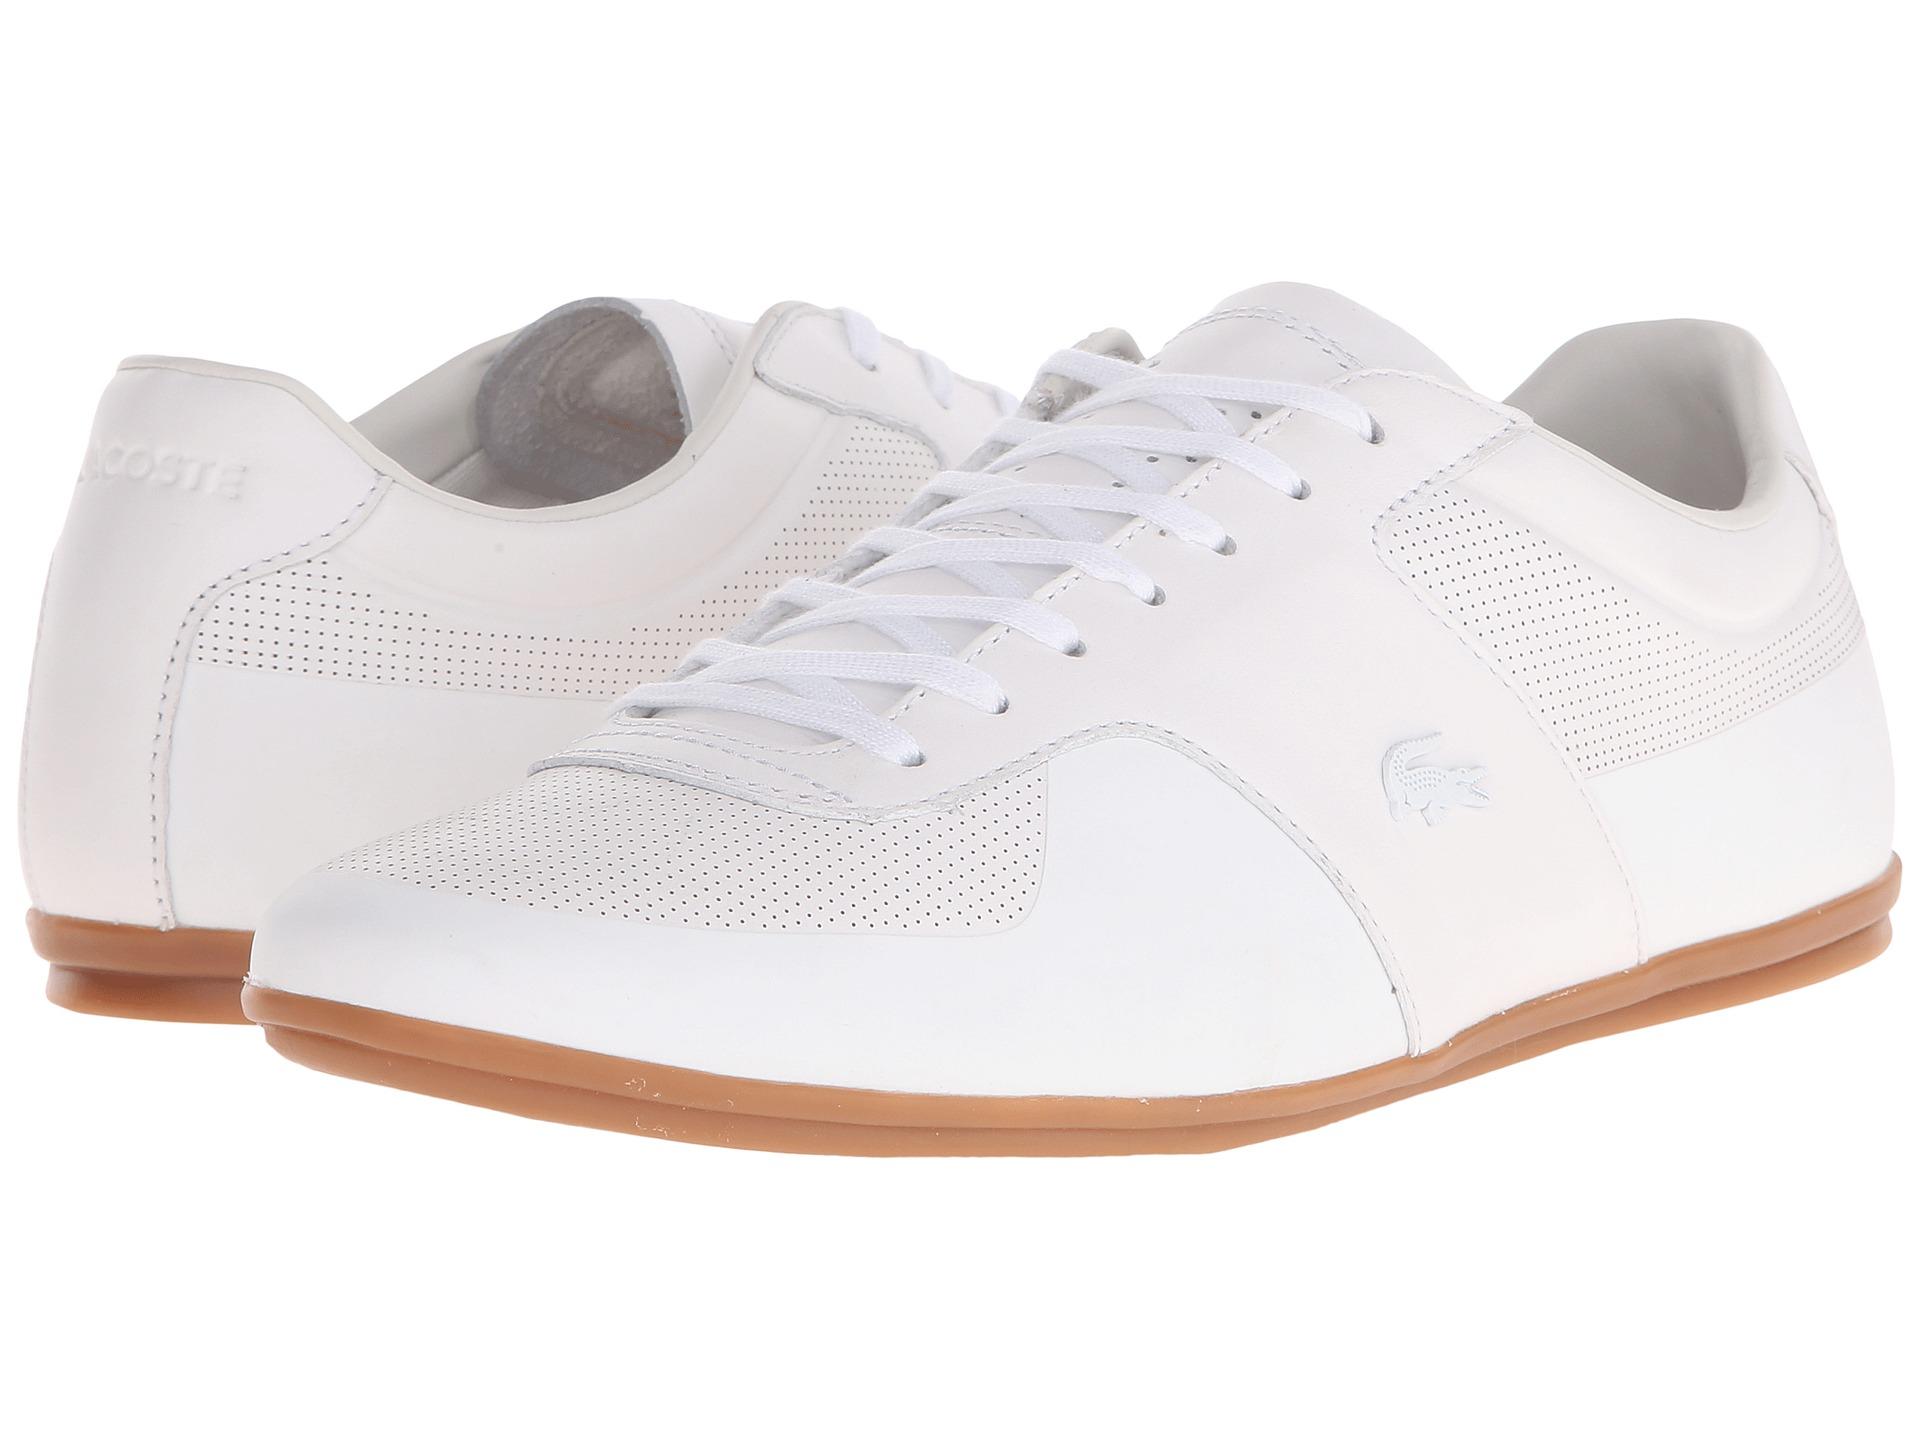 223f12781e4436 Lyst - Lacoste Turnier 116 1 in White for Men